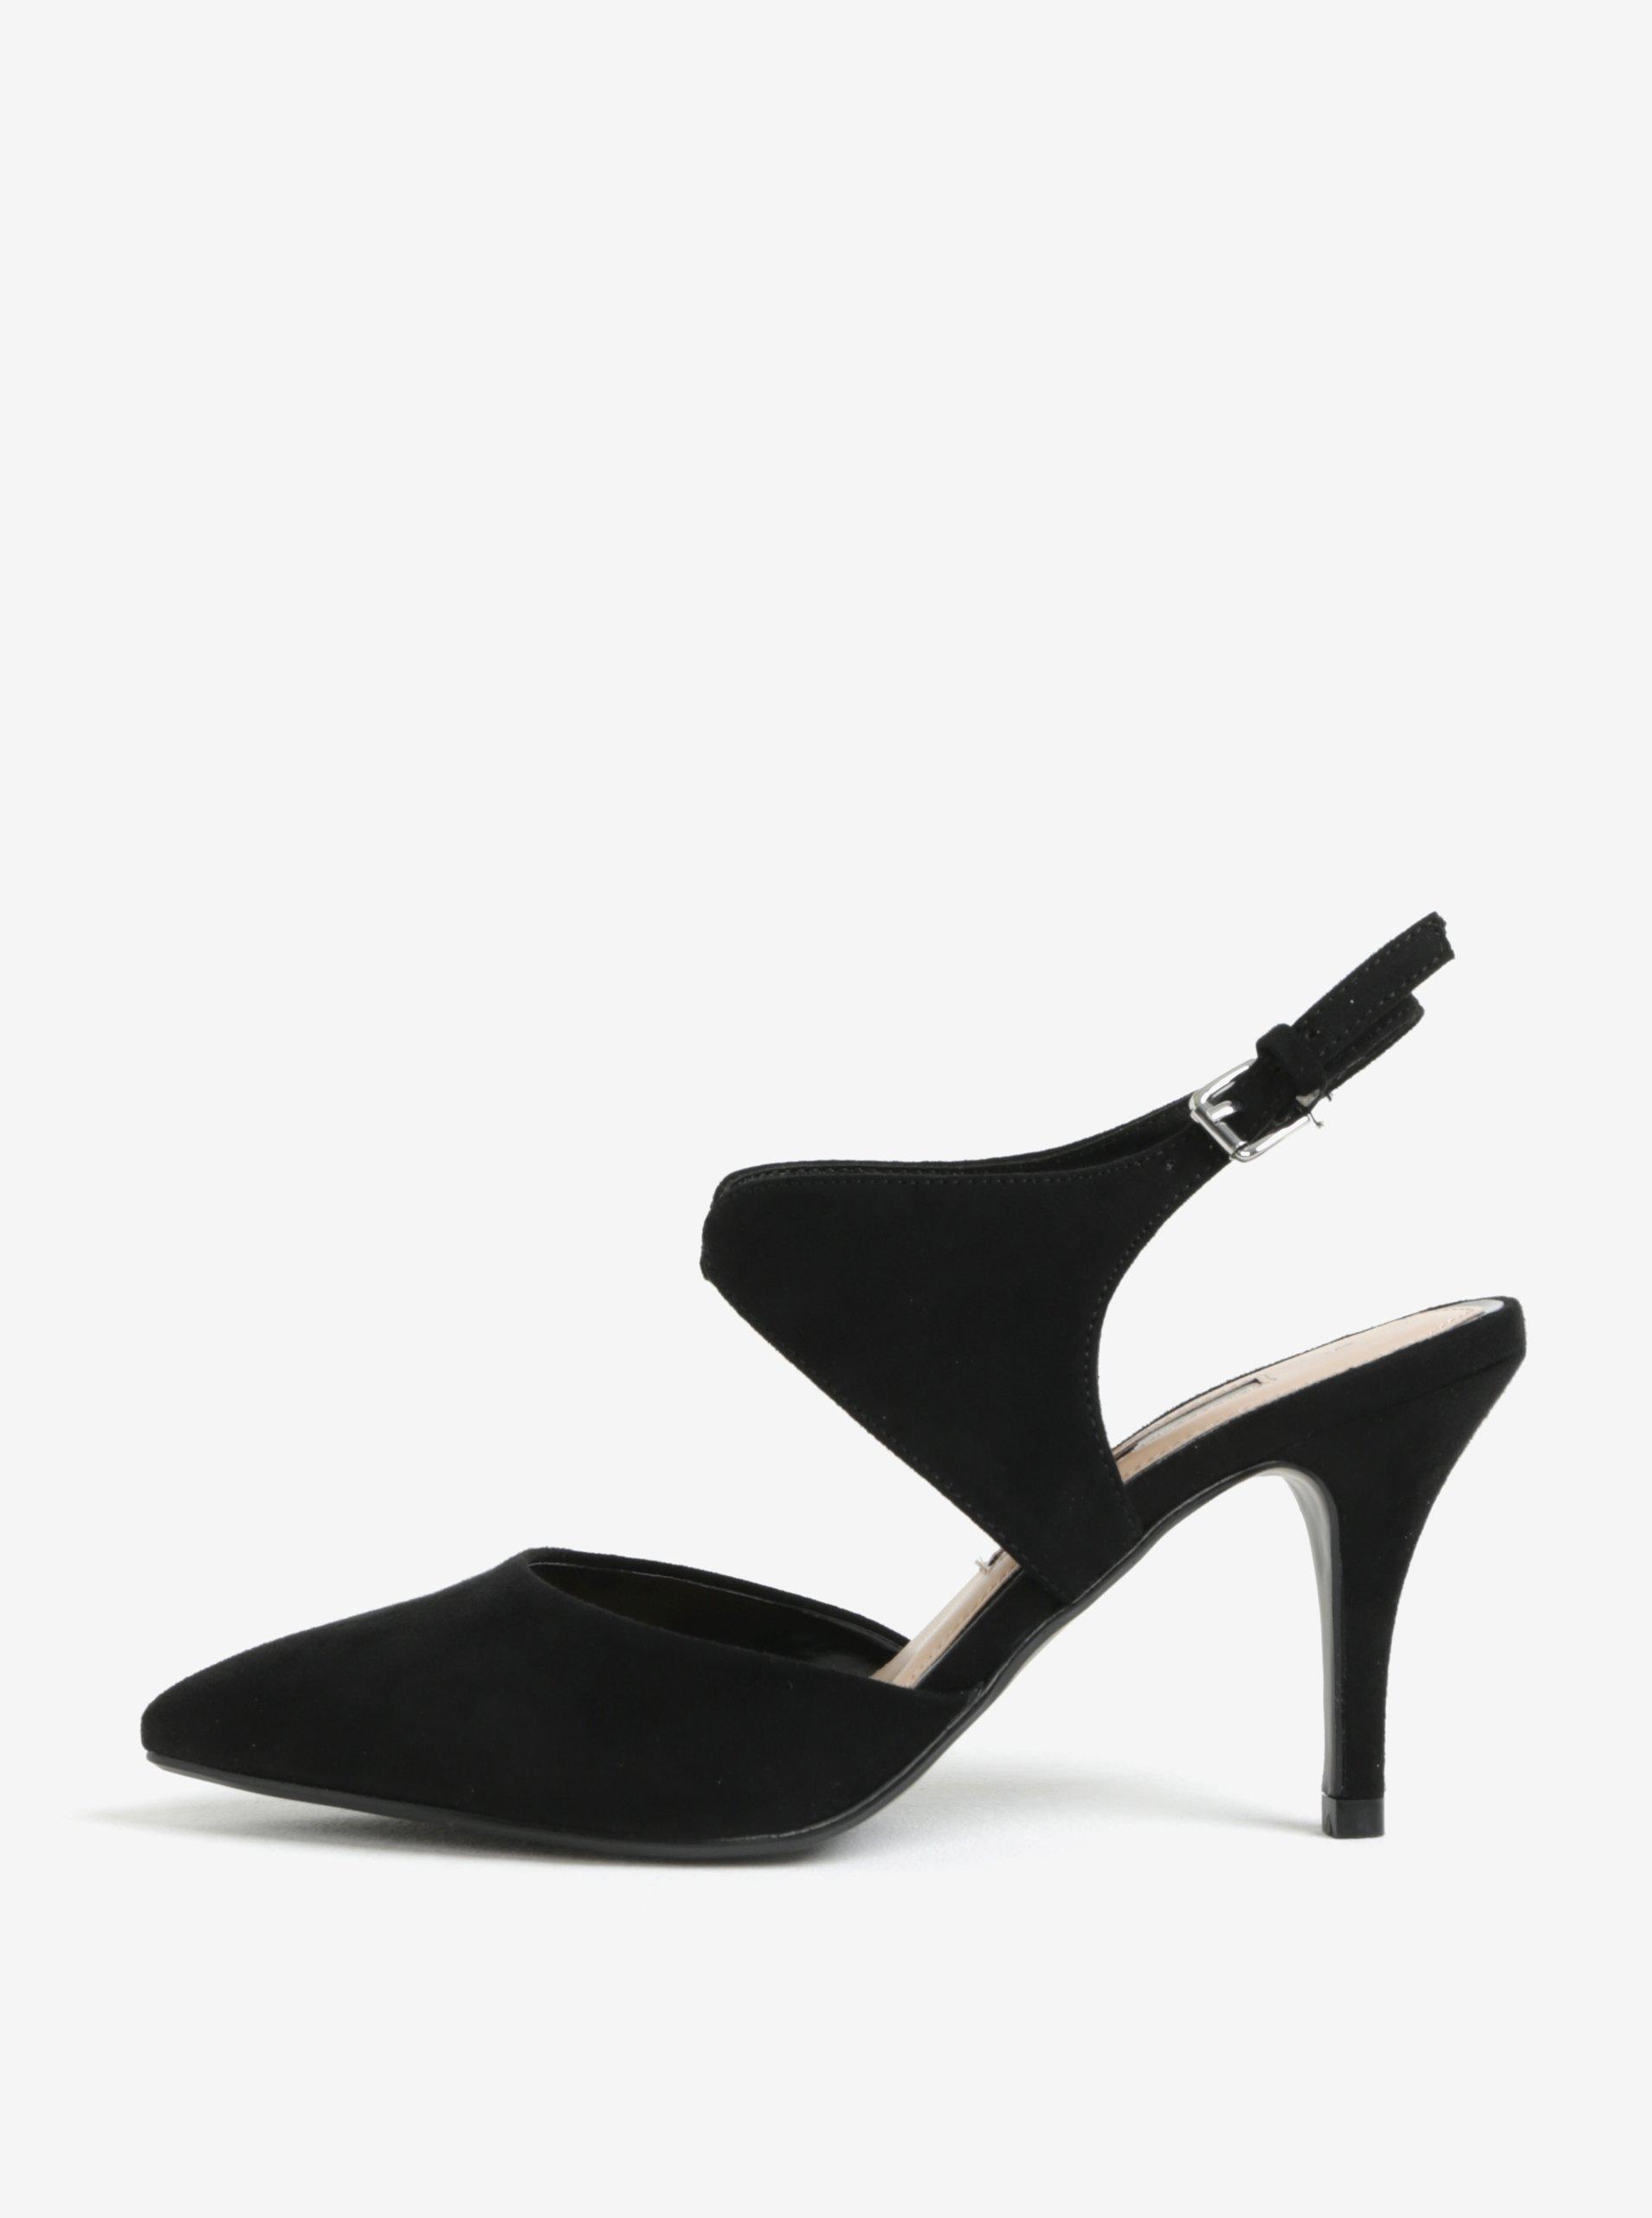 0aa93eeafa839 Čierne sandálky v semišovej úprave Dorothy Perkins